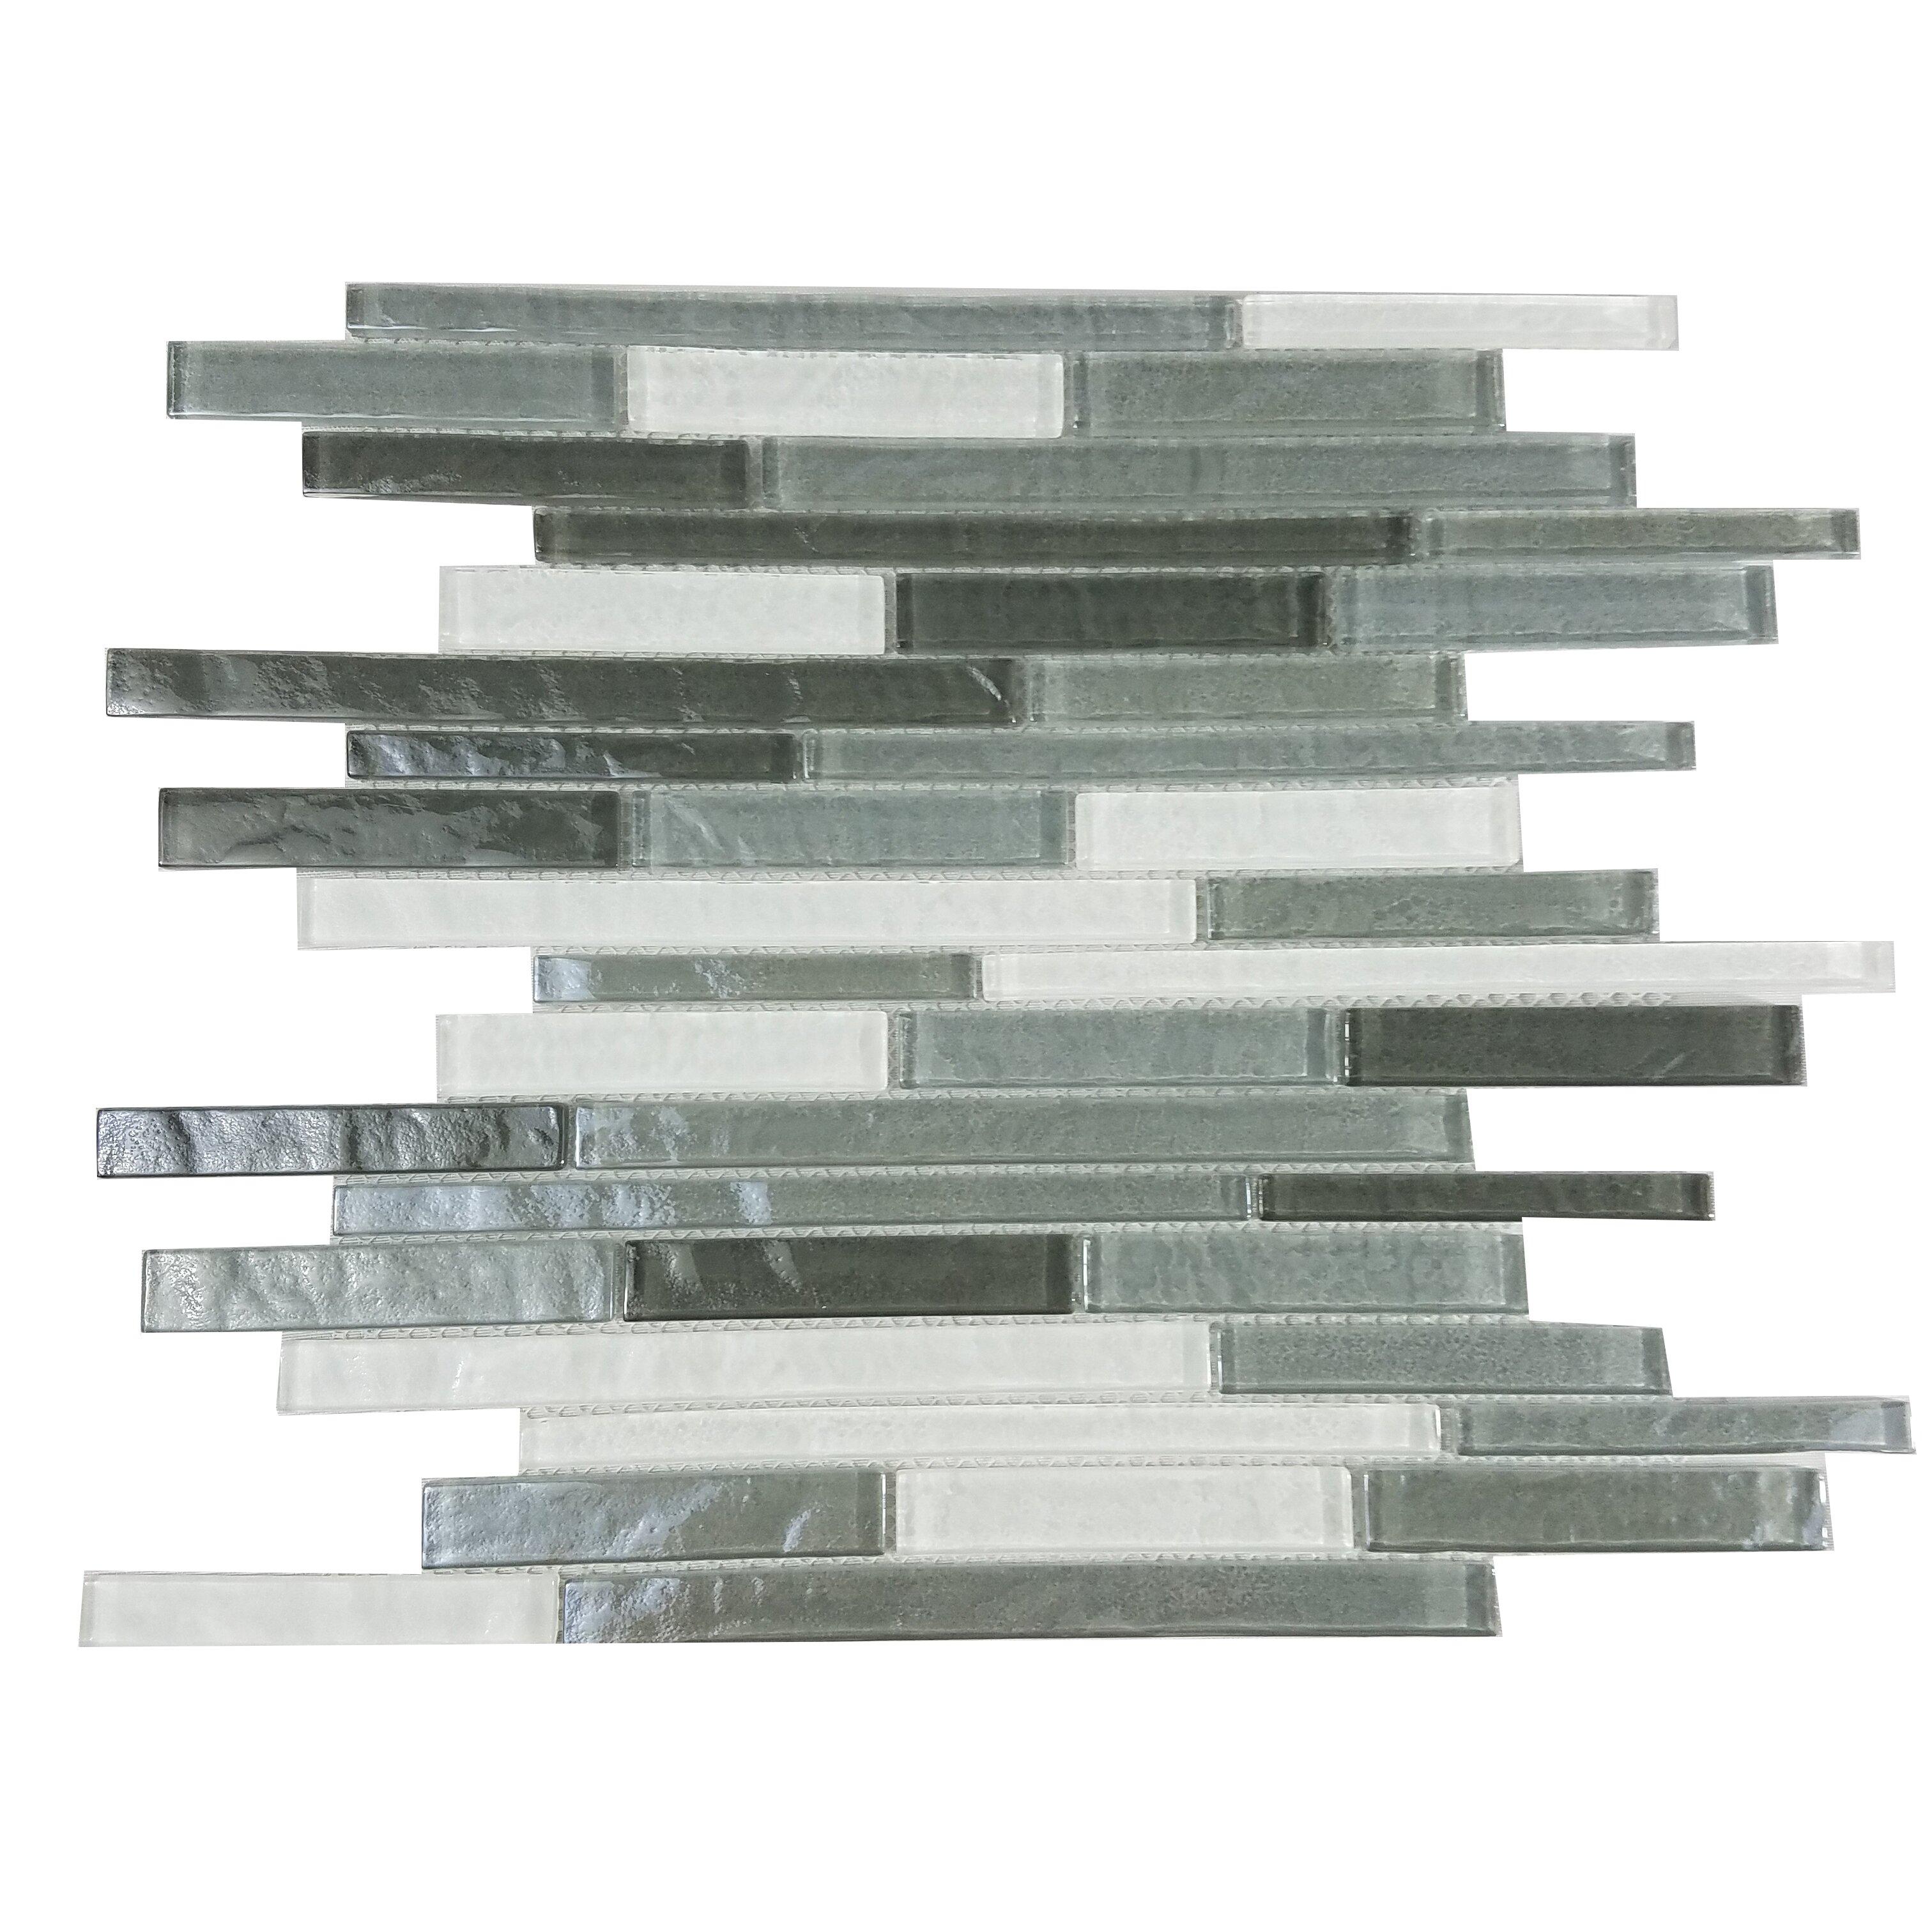 Abolos Geo Random Sized Glass Mosaic Tile in Gray ...